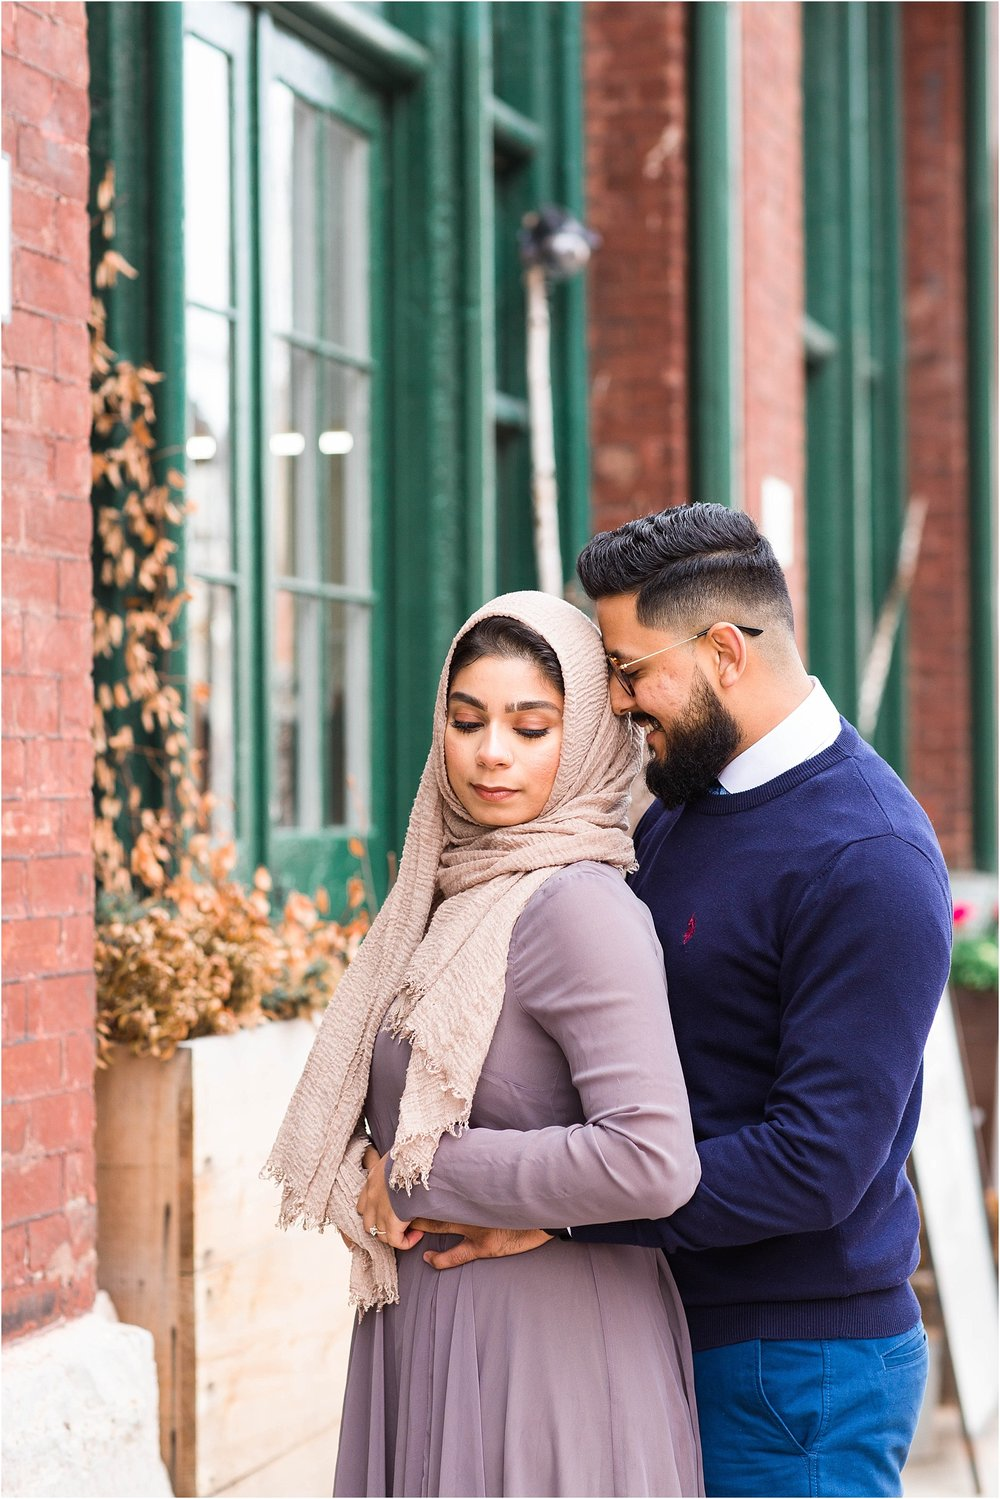 Polson-Pier-Distillery-District-Engagement-Session-Toronto-Mississauga-Brampton-Scarborough-GTA-Pakistani-Indian-Wedding-Engagement-Photographer-Photography_0041.jpg